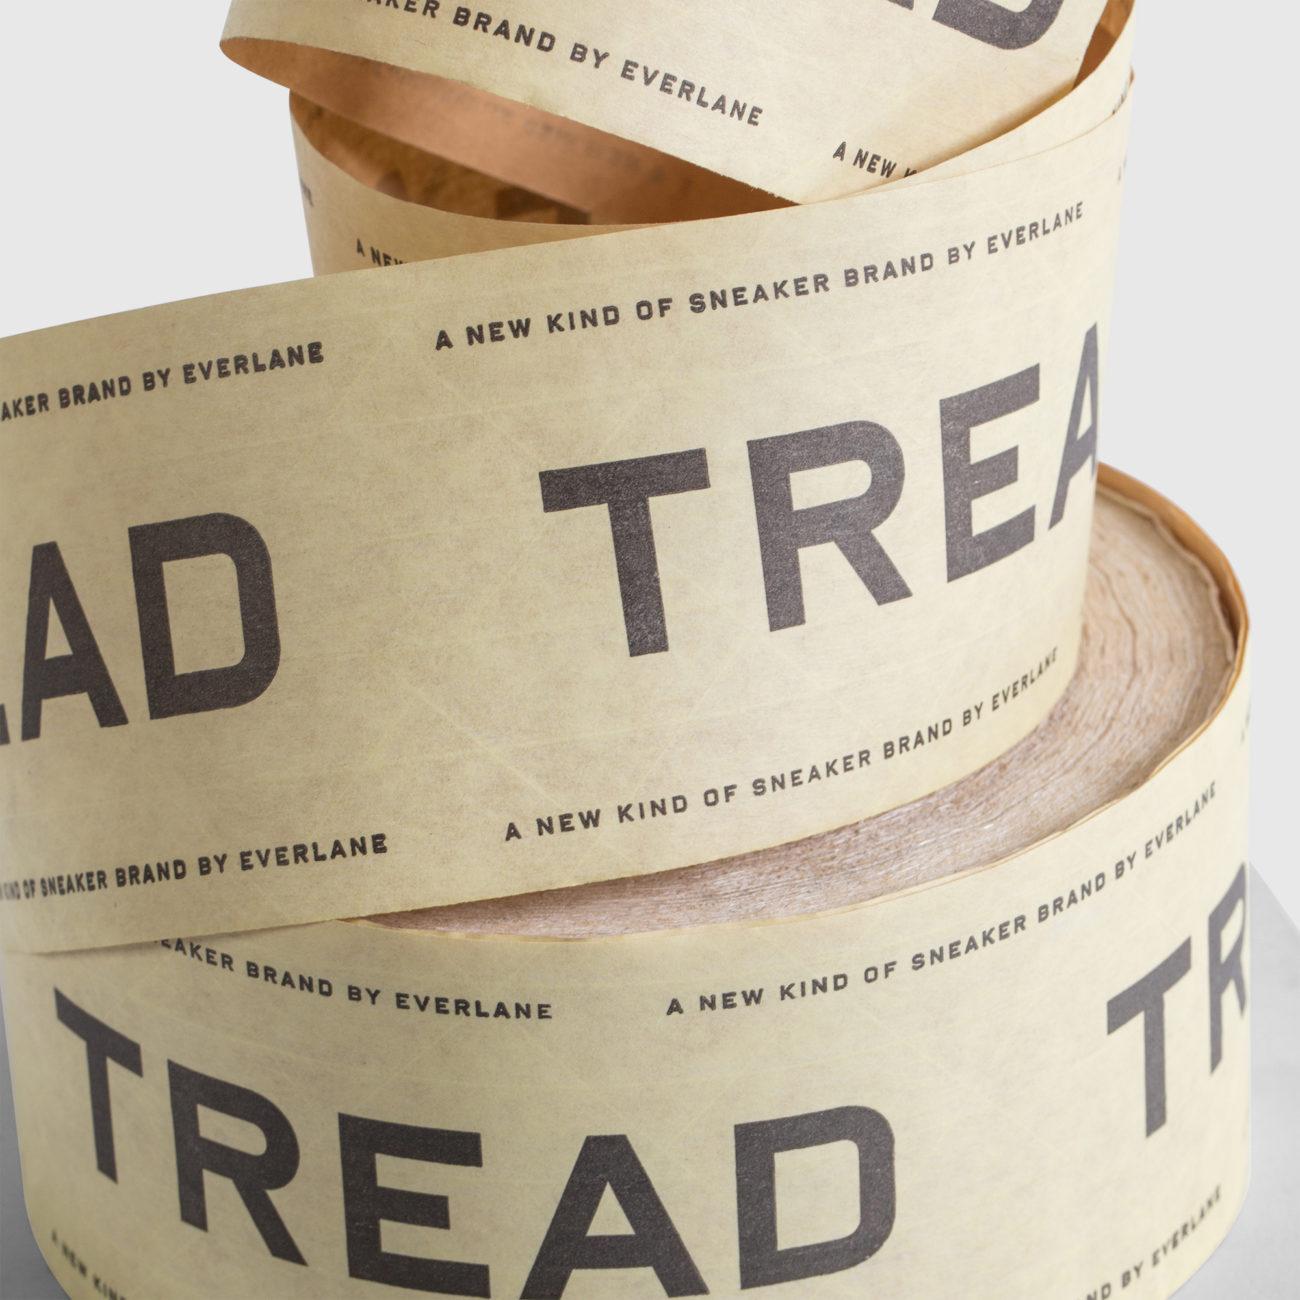 Custom reinforced gummed paper tape Flexography on reinforced kraft paper.